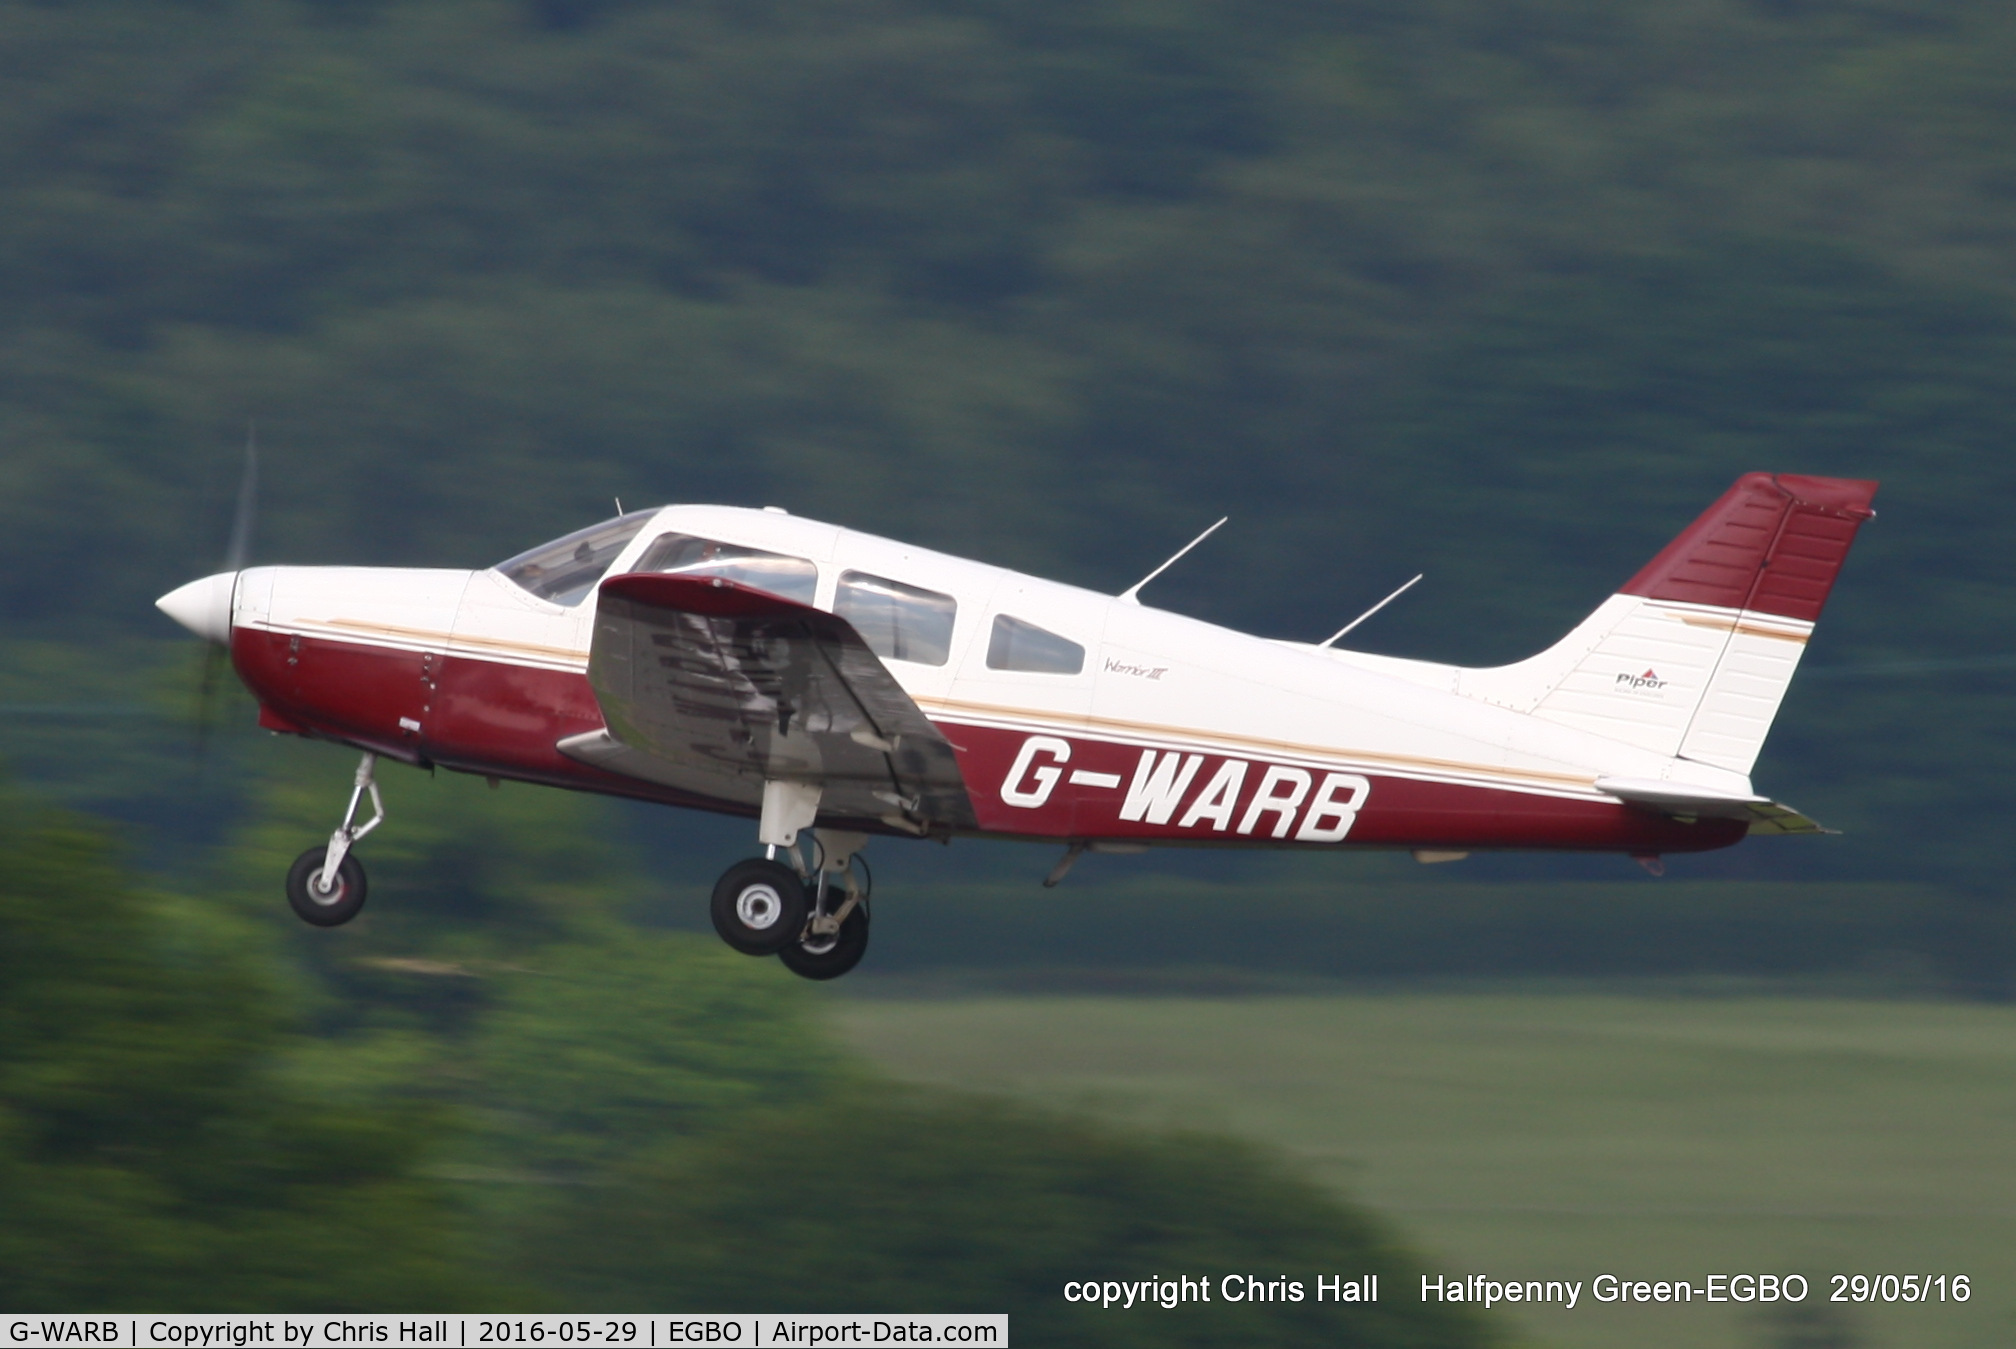 G-WARB, 1998 Piper PA-28-161 Cherokee Warrior III C/N 28-42034, at Halfpenny Green